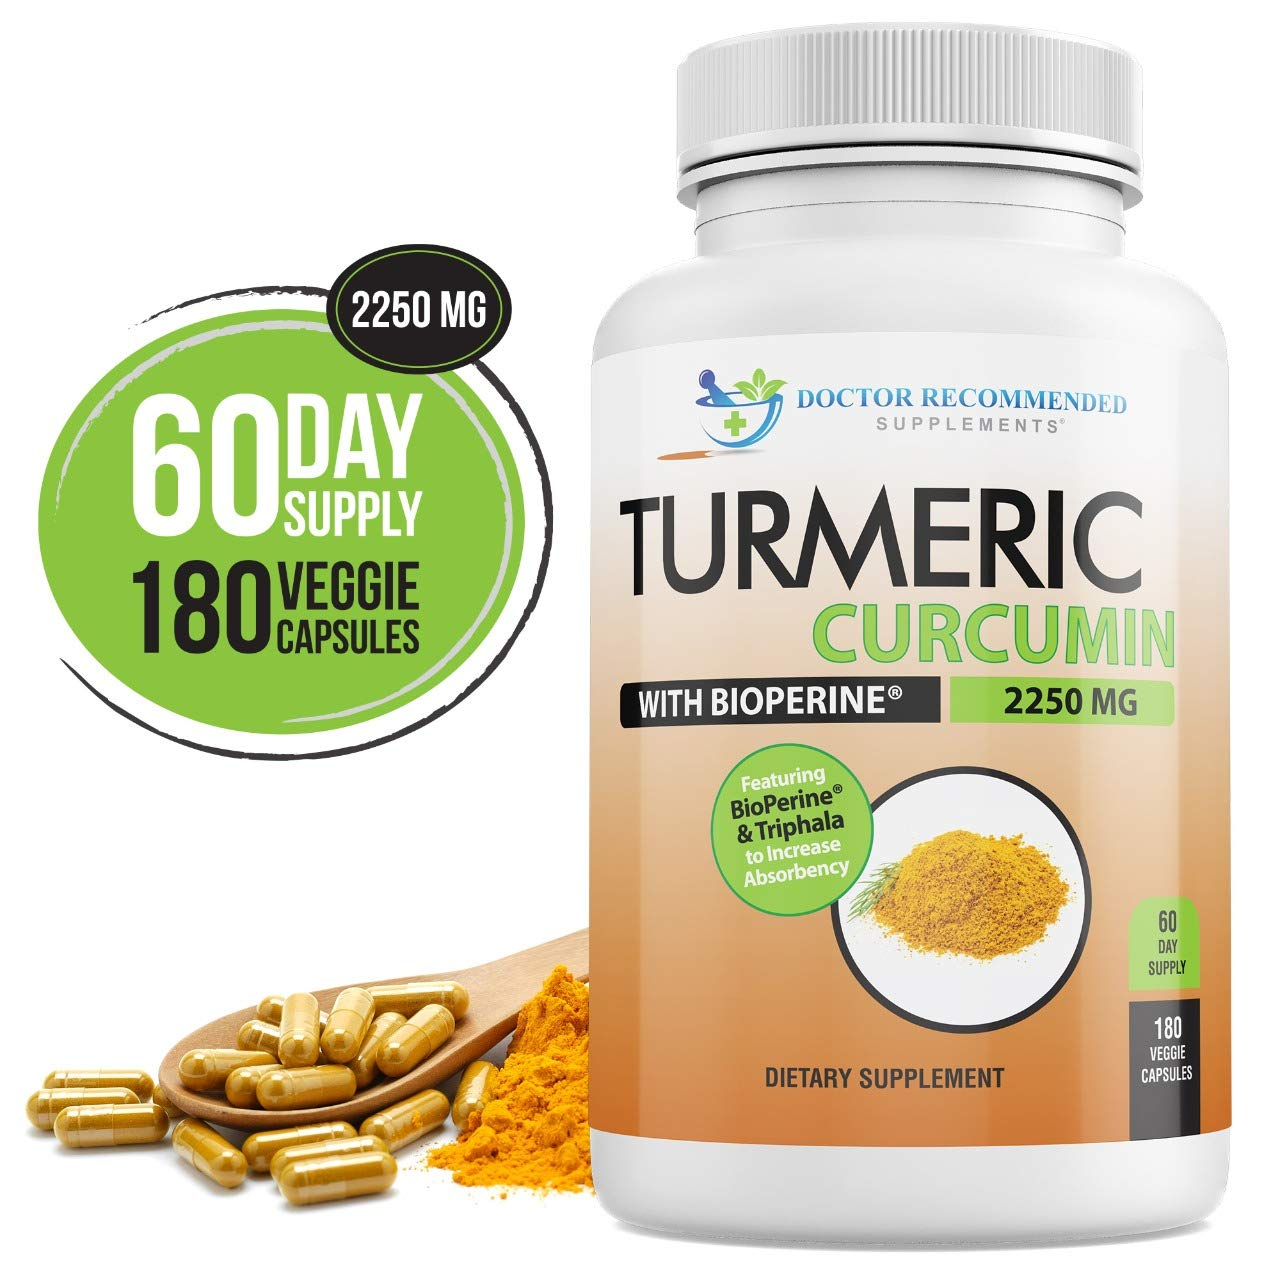 Turmeric Curcumin Curcuminoids Bioperine Supplement